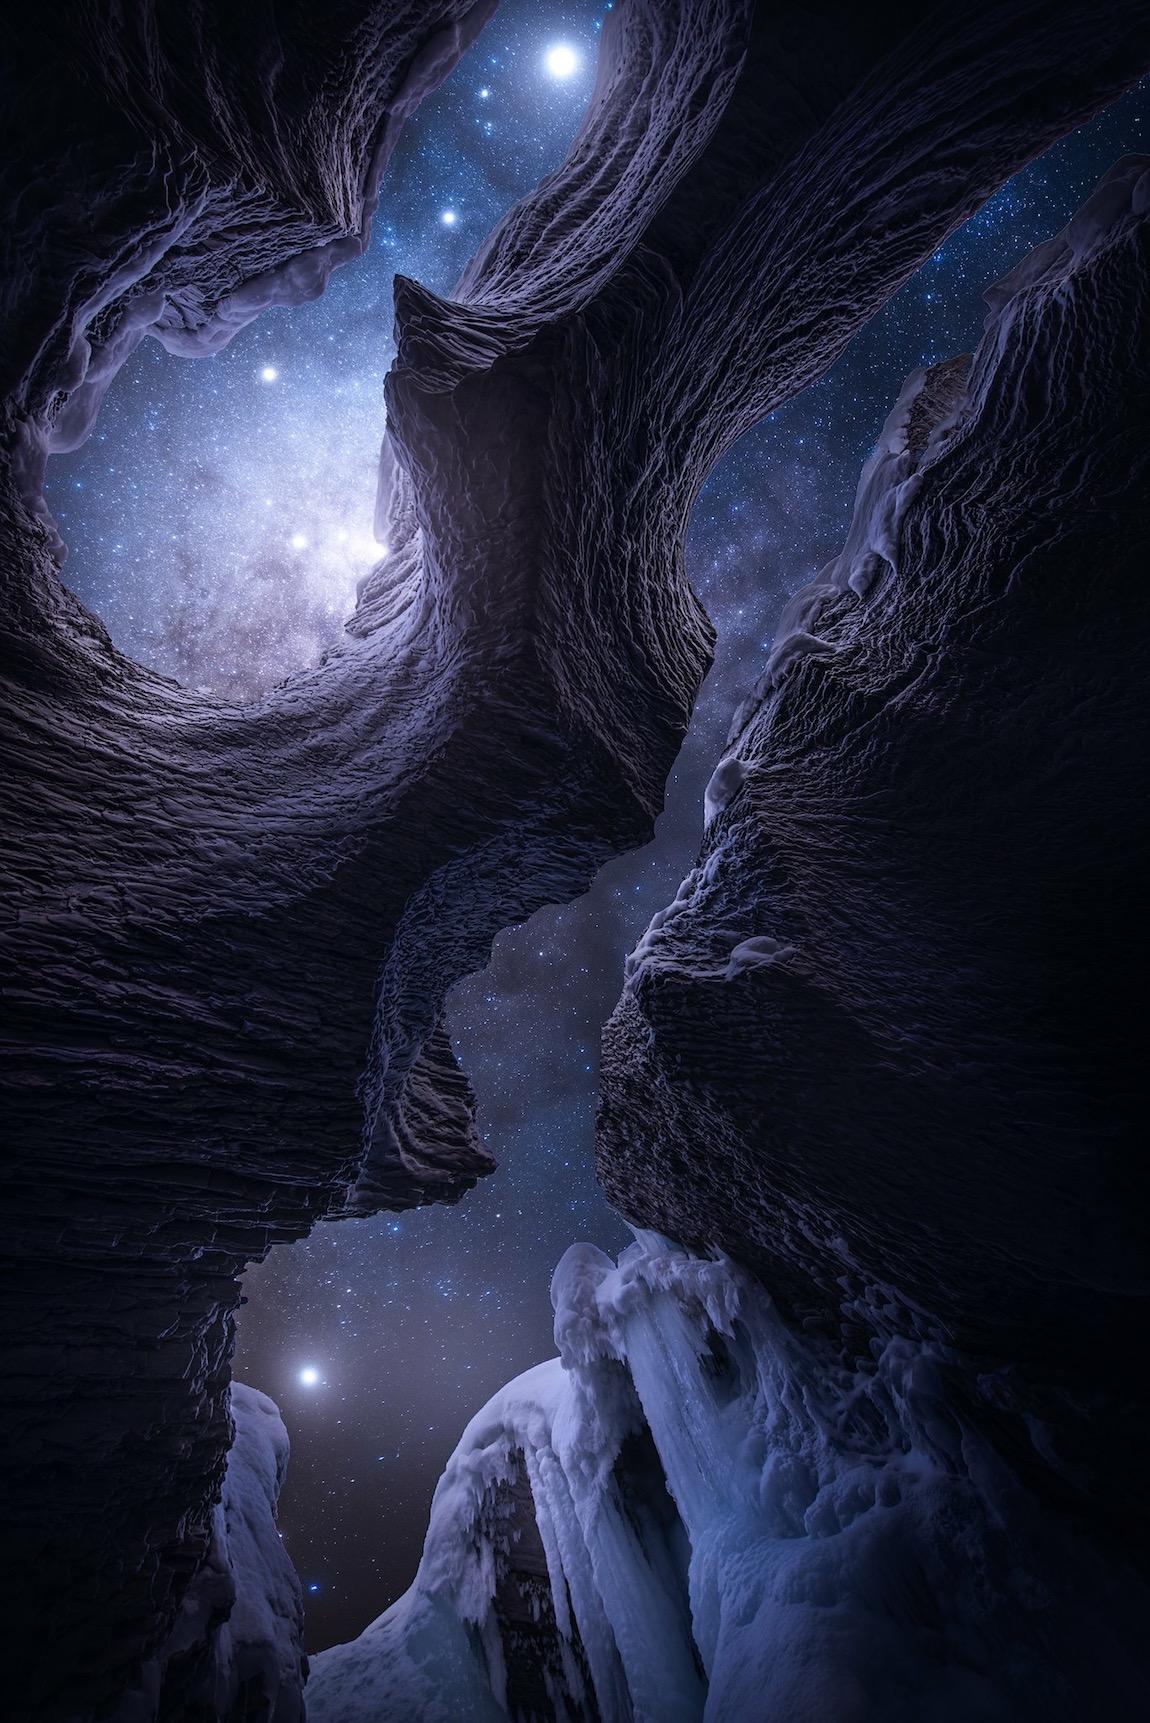 night-landscape-photography-2